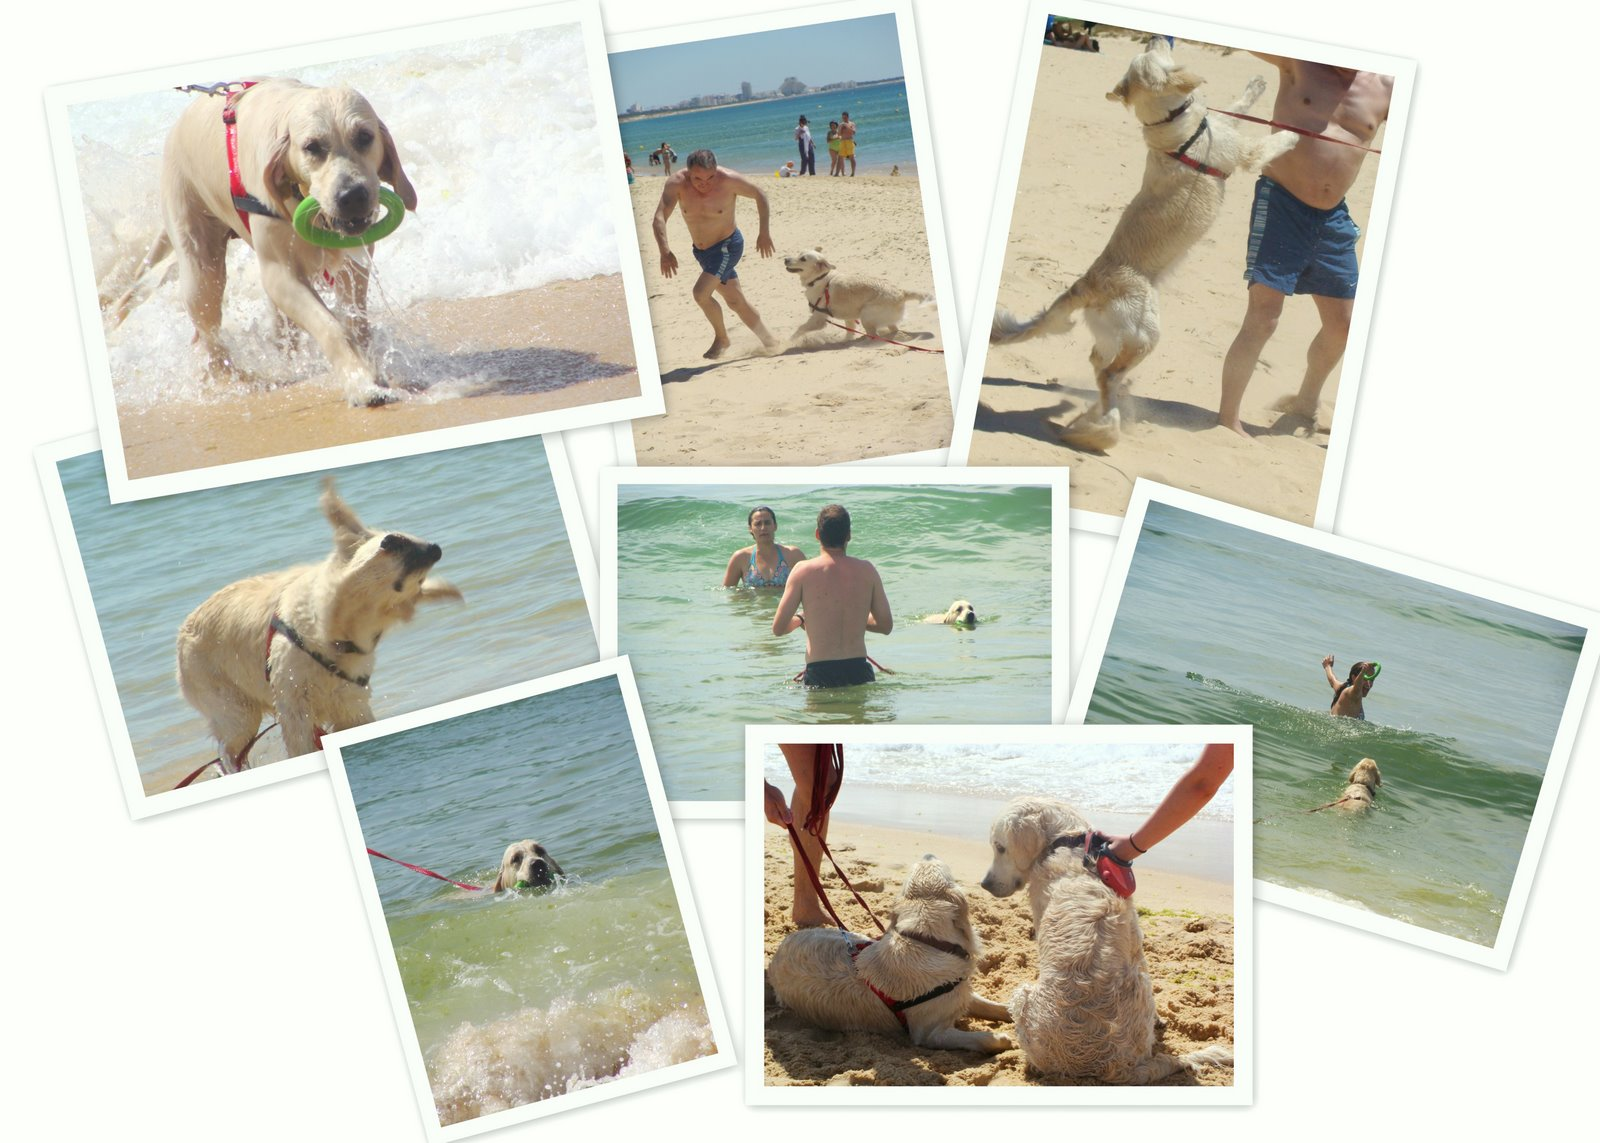 [Collage+Algarve+beach+2009]